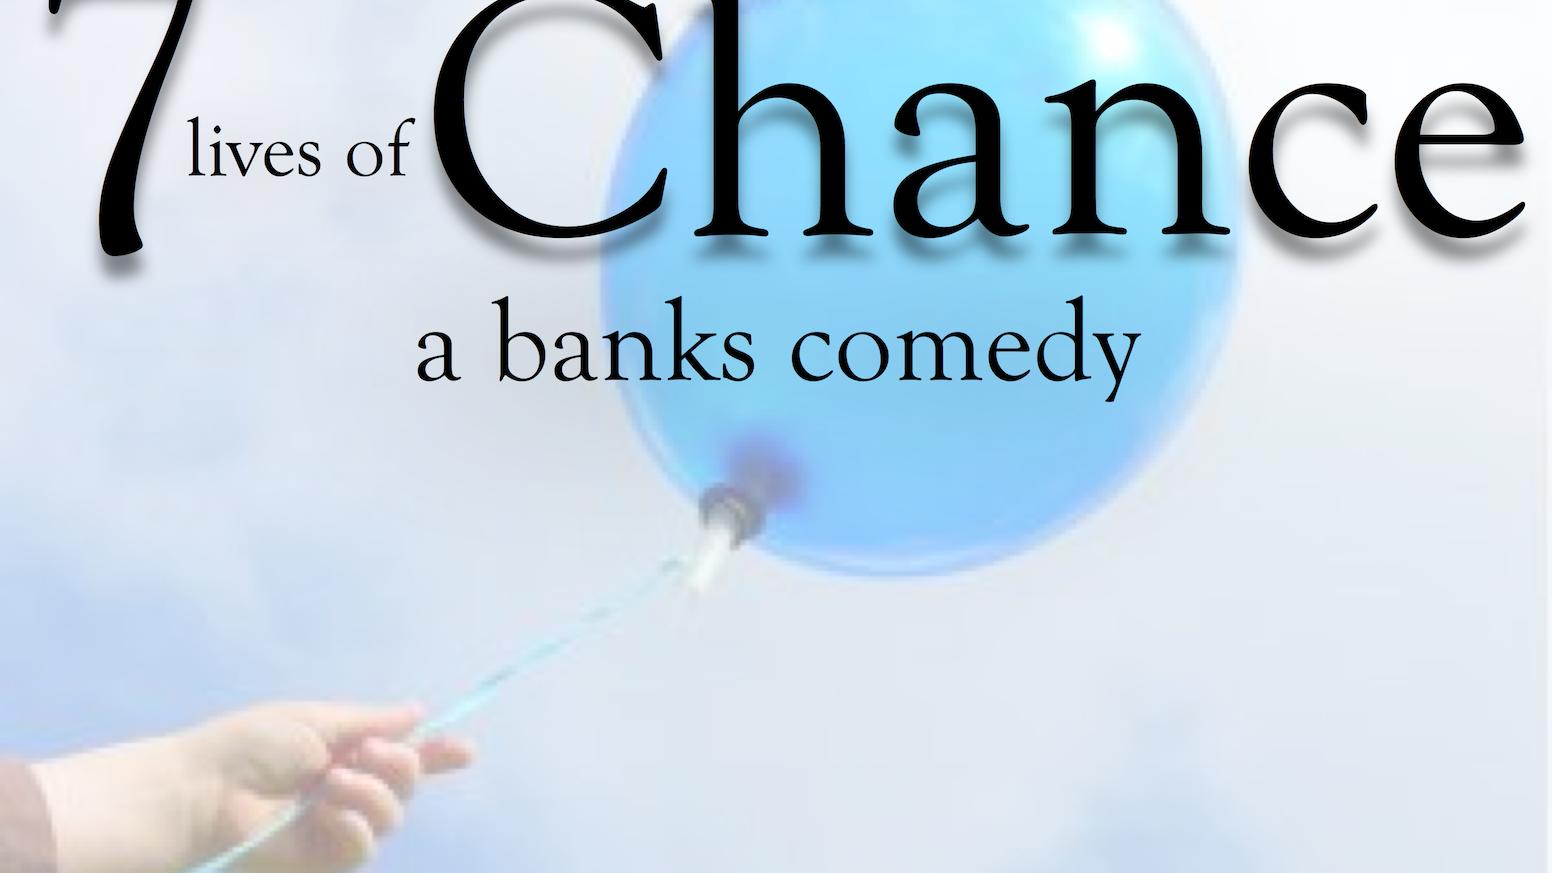 Life line comedy bar : Ptv drama aashiyana episode 14 youtube